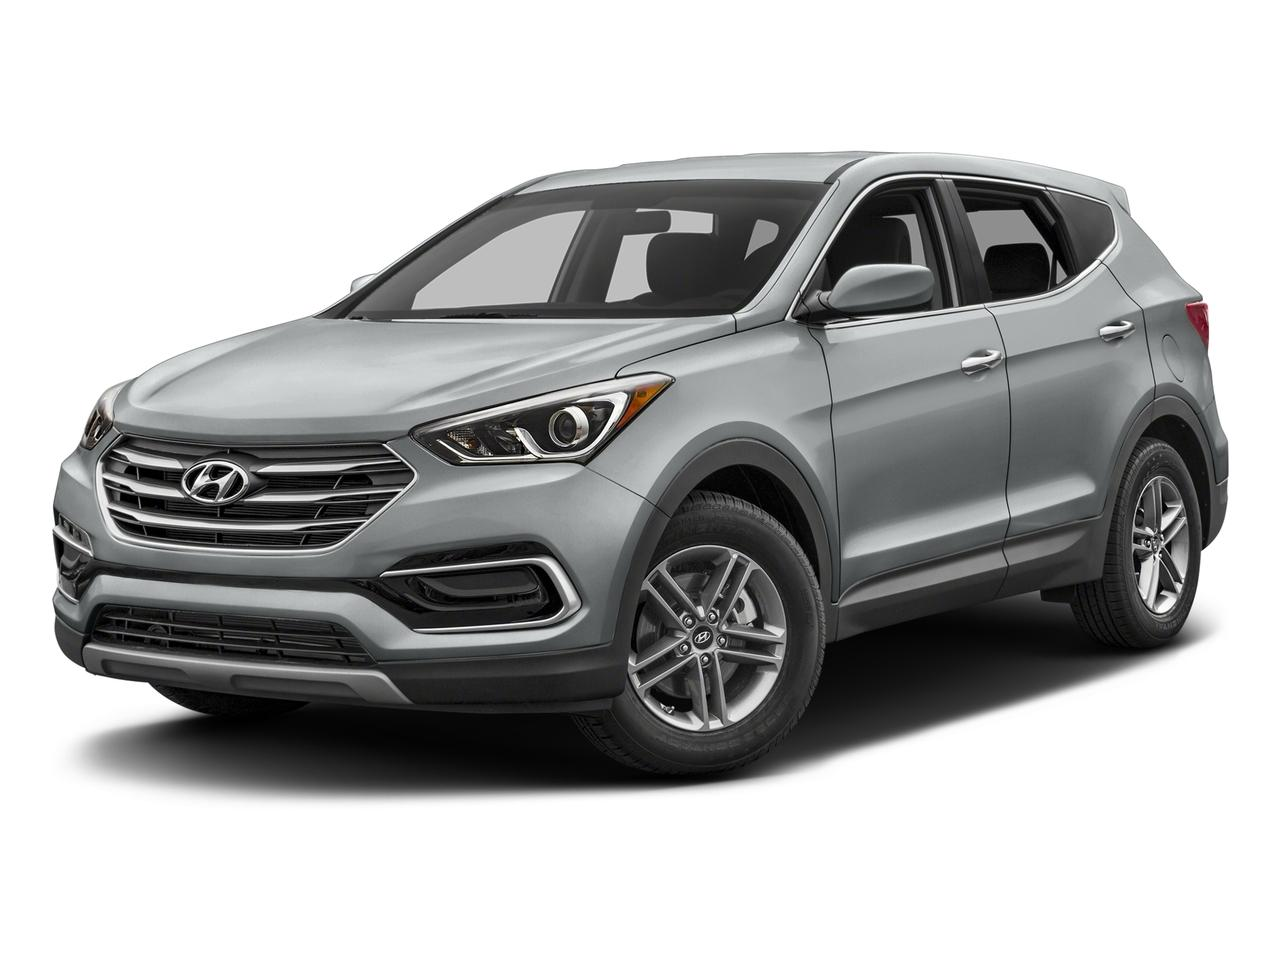 2017 Hyundai Santa Fe Sport Vehicle Photo in Plainfield, IL 60586